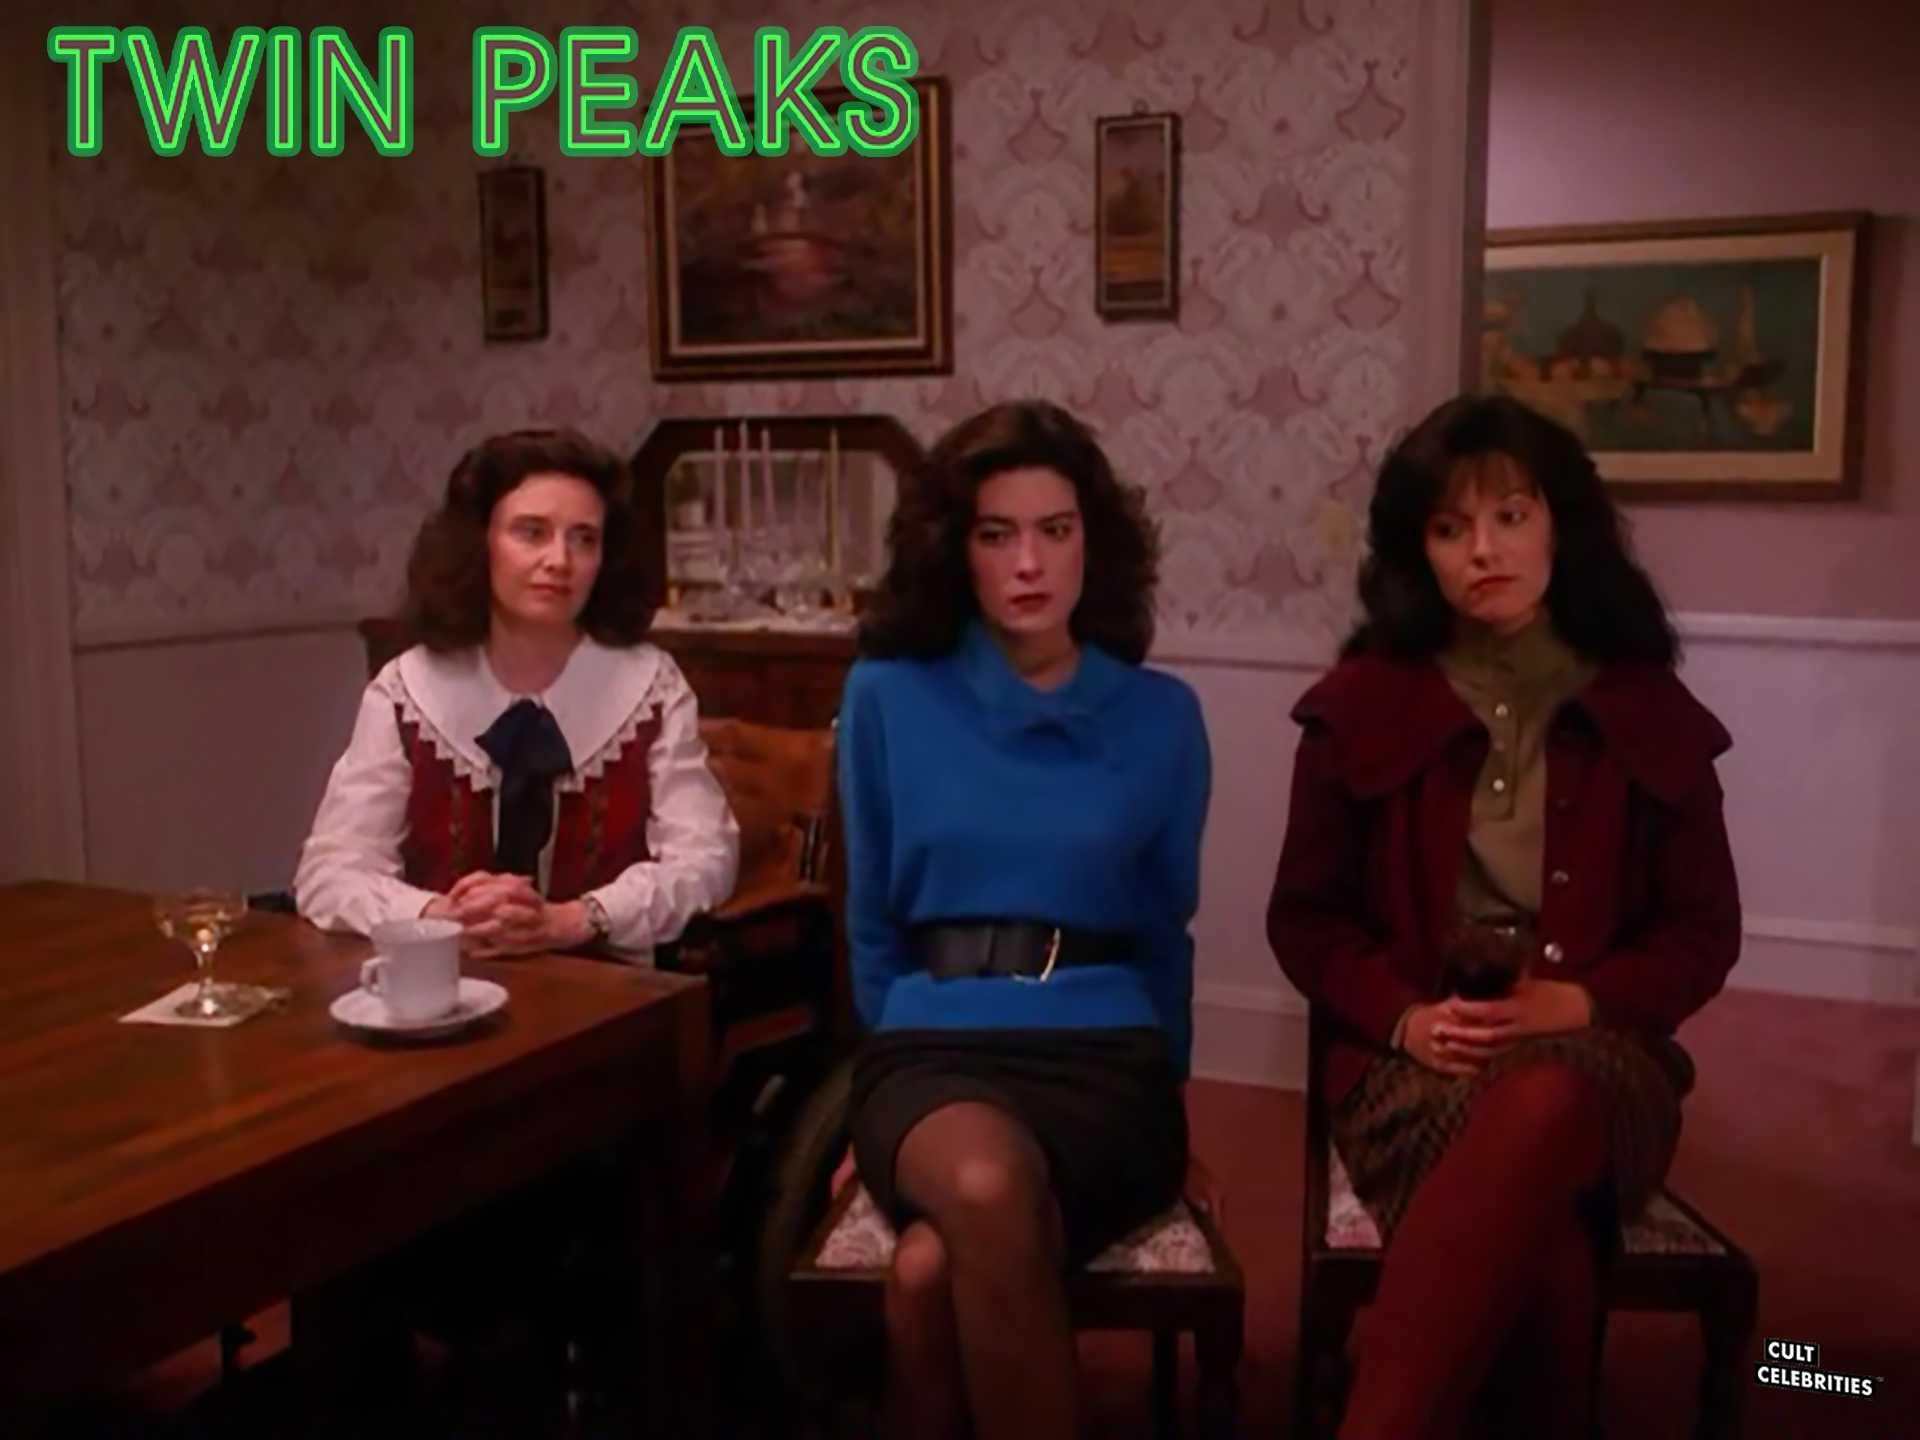 Lara Flynn Boyle and Sheryl Lee in Twin Peaks (1990)